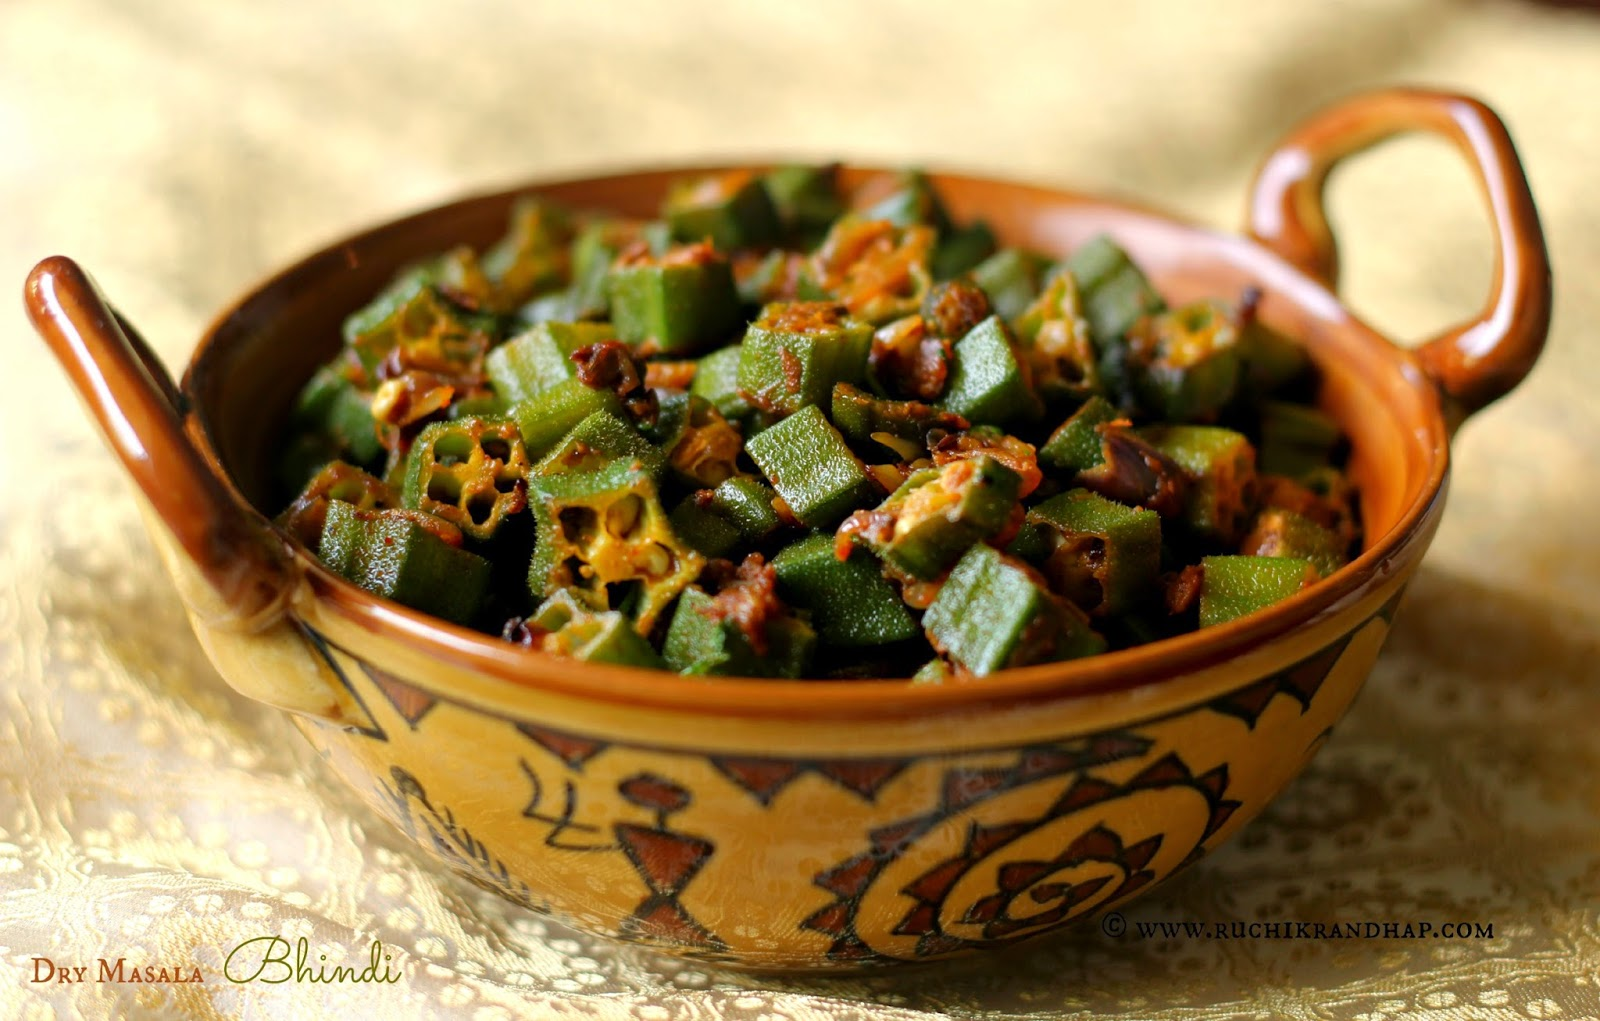 Bhindi Masala Restaurant Style Sailus Food